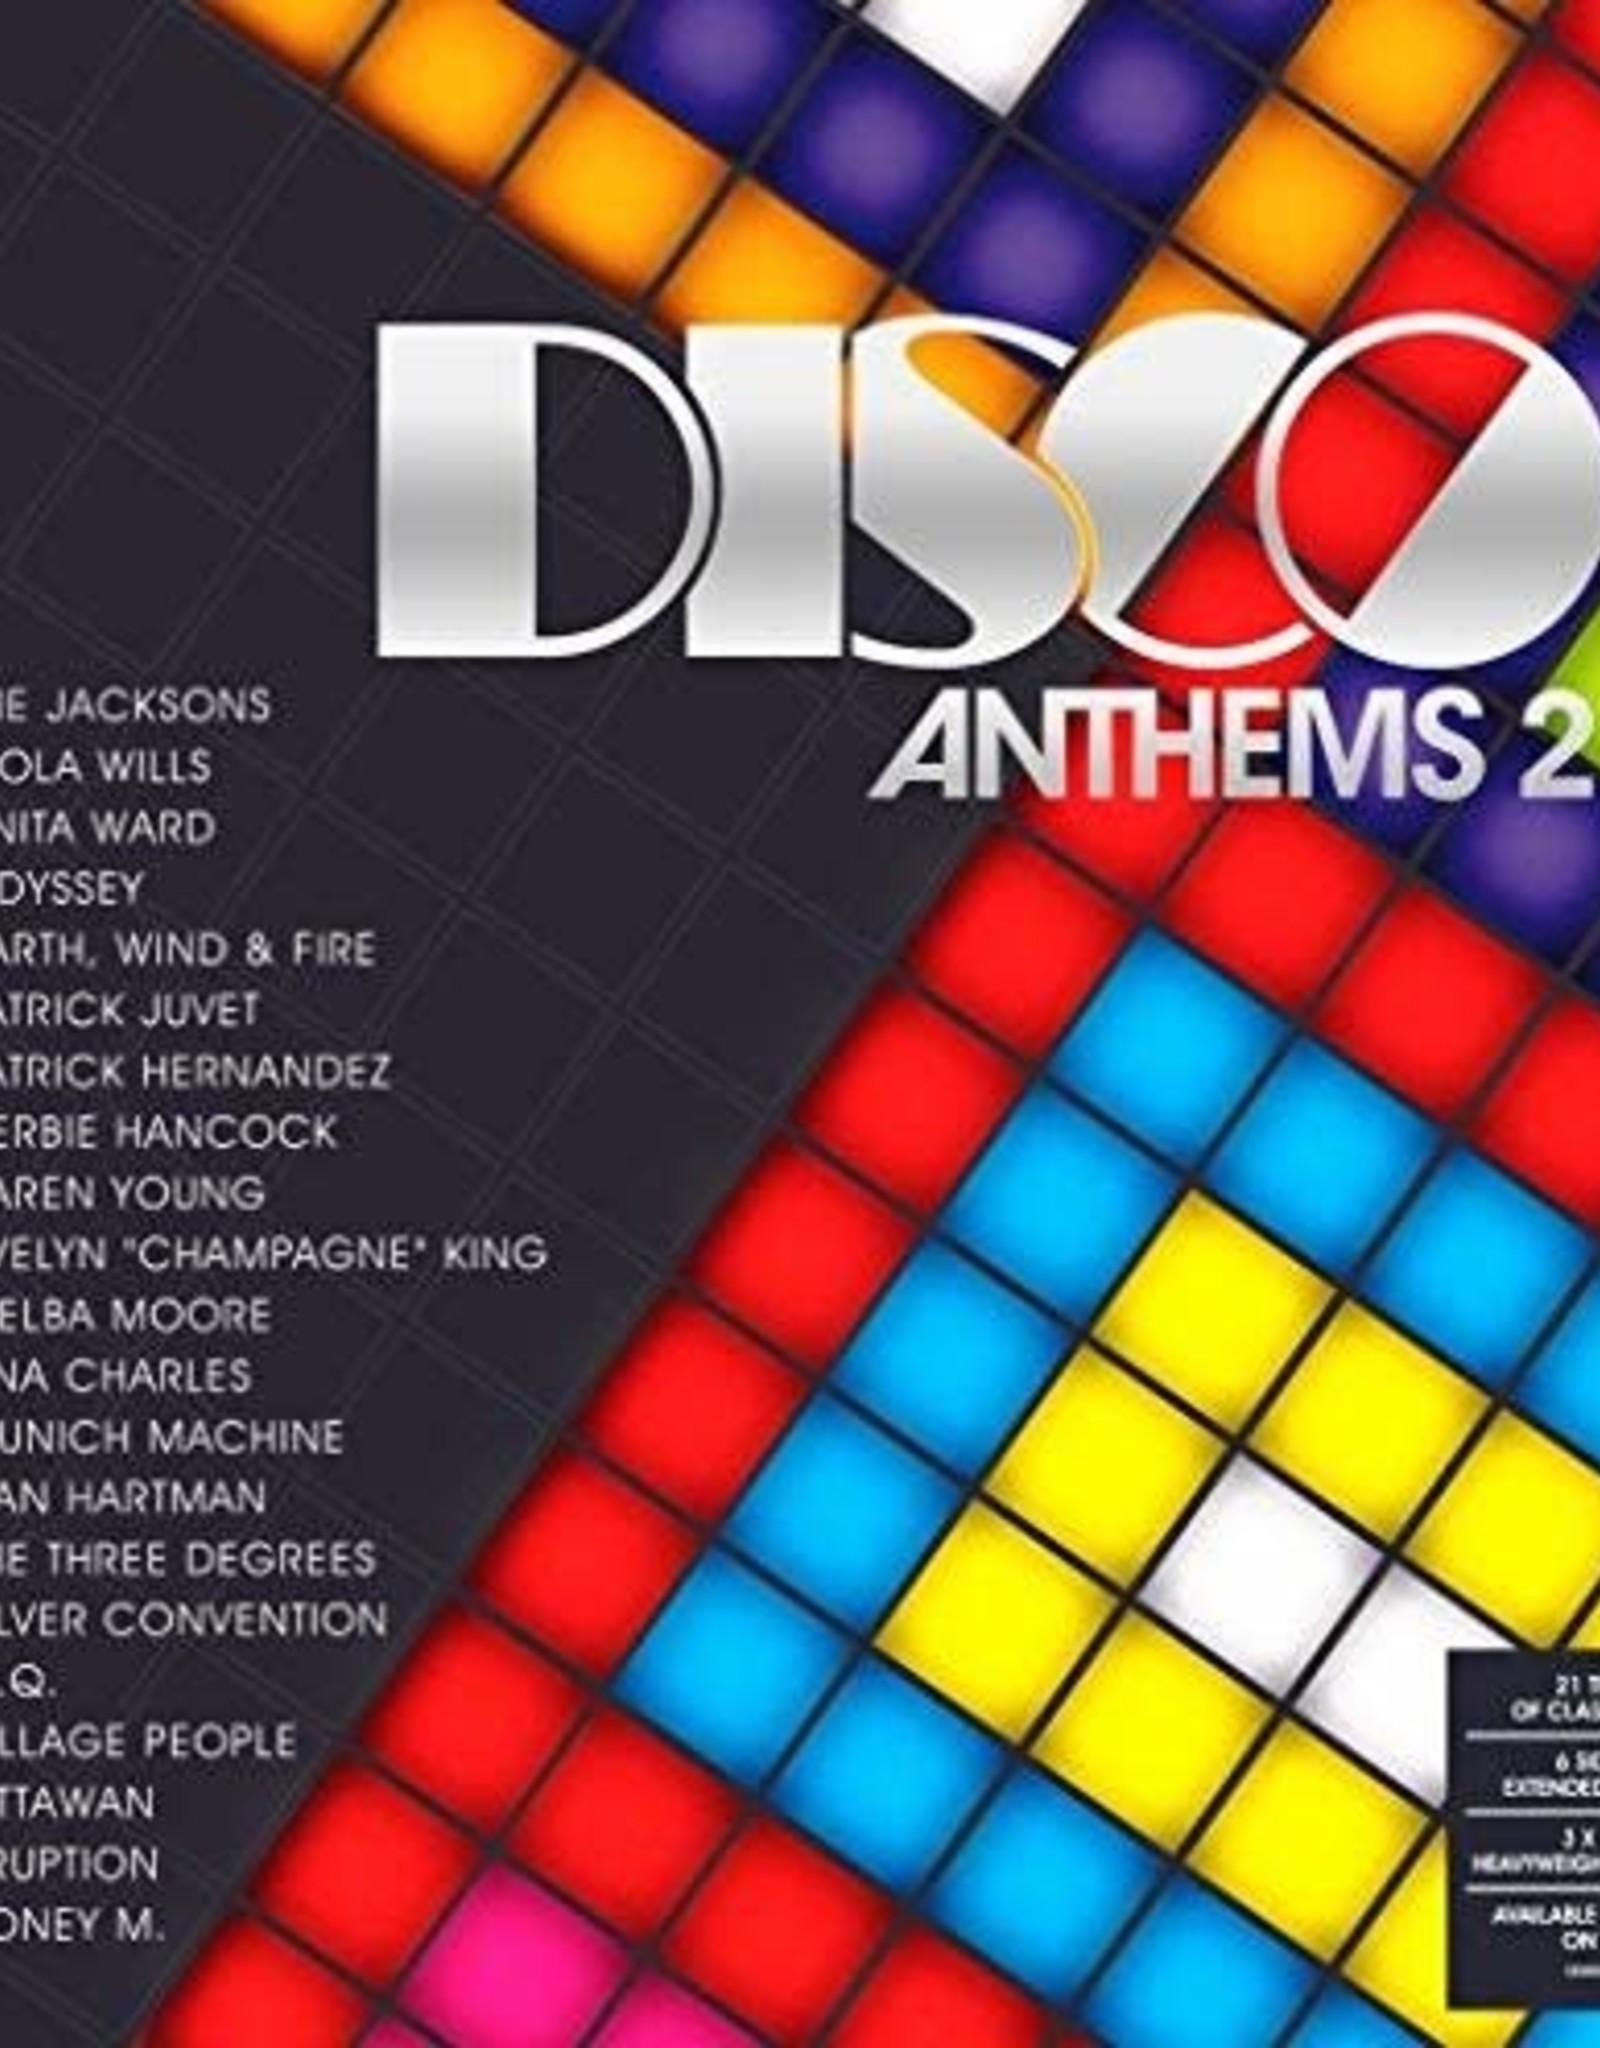 Disco Anthems 2 3LP Compilation